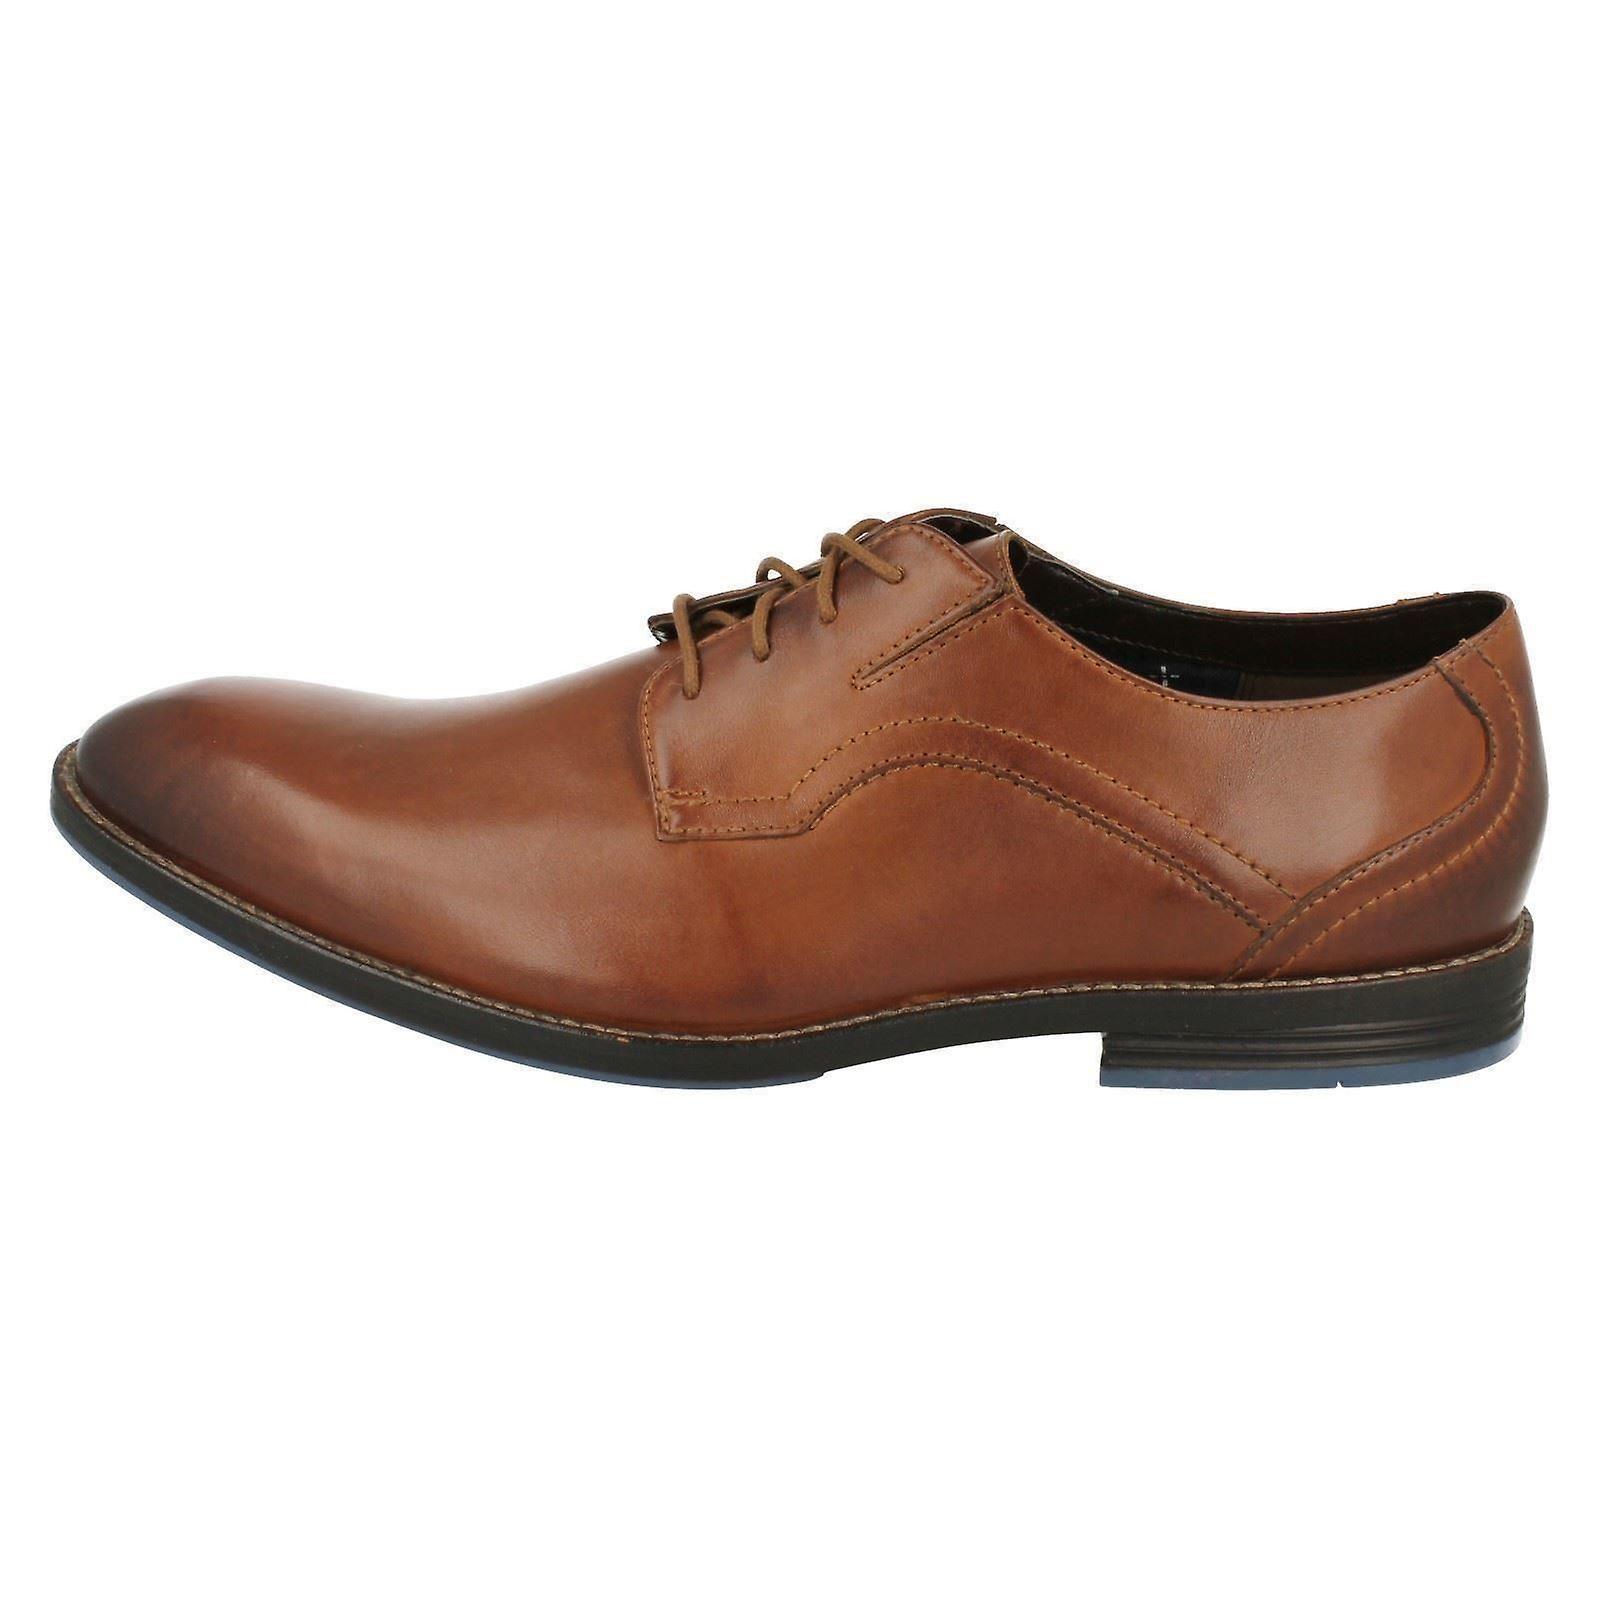 Shoes Mens Prangley Formal Clarks Walk TqHqpSXw